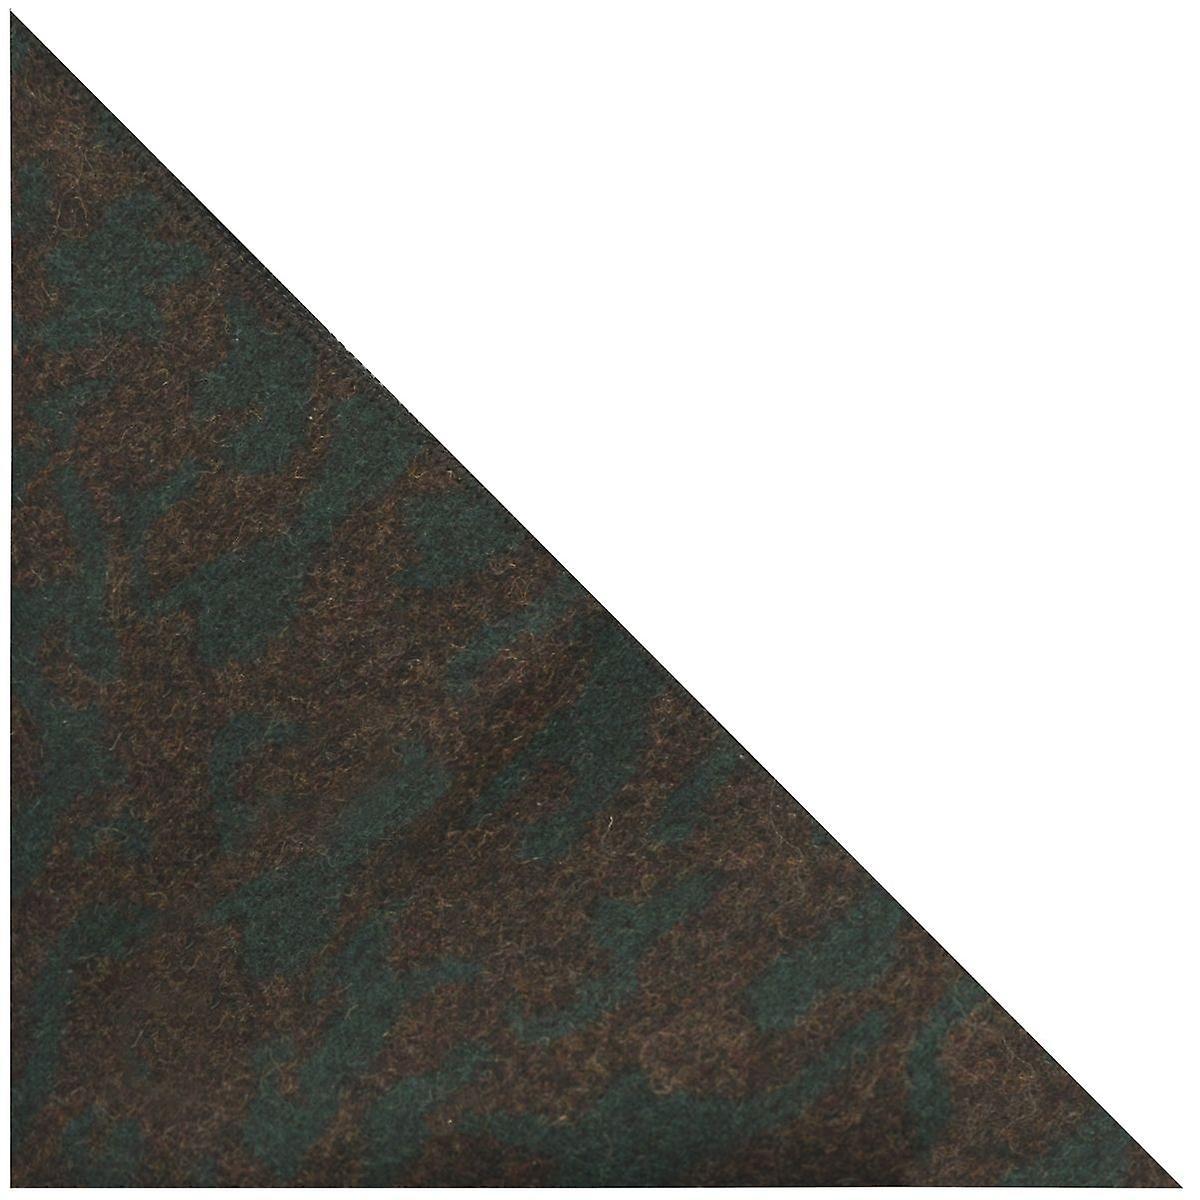 Luxury Persian Dark Teal Pattern Pocket Square, Handkerchief